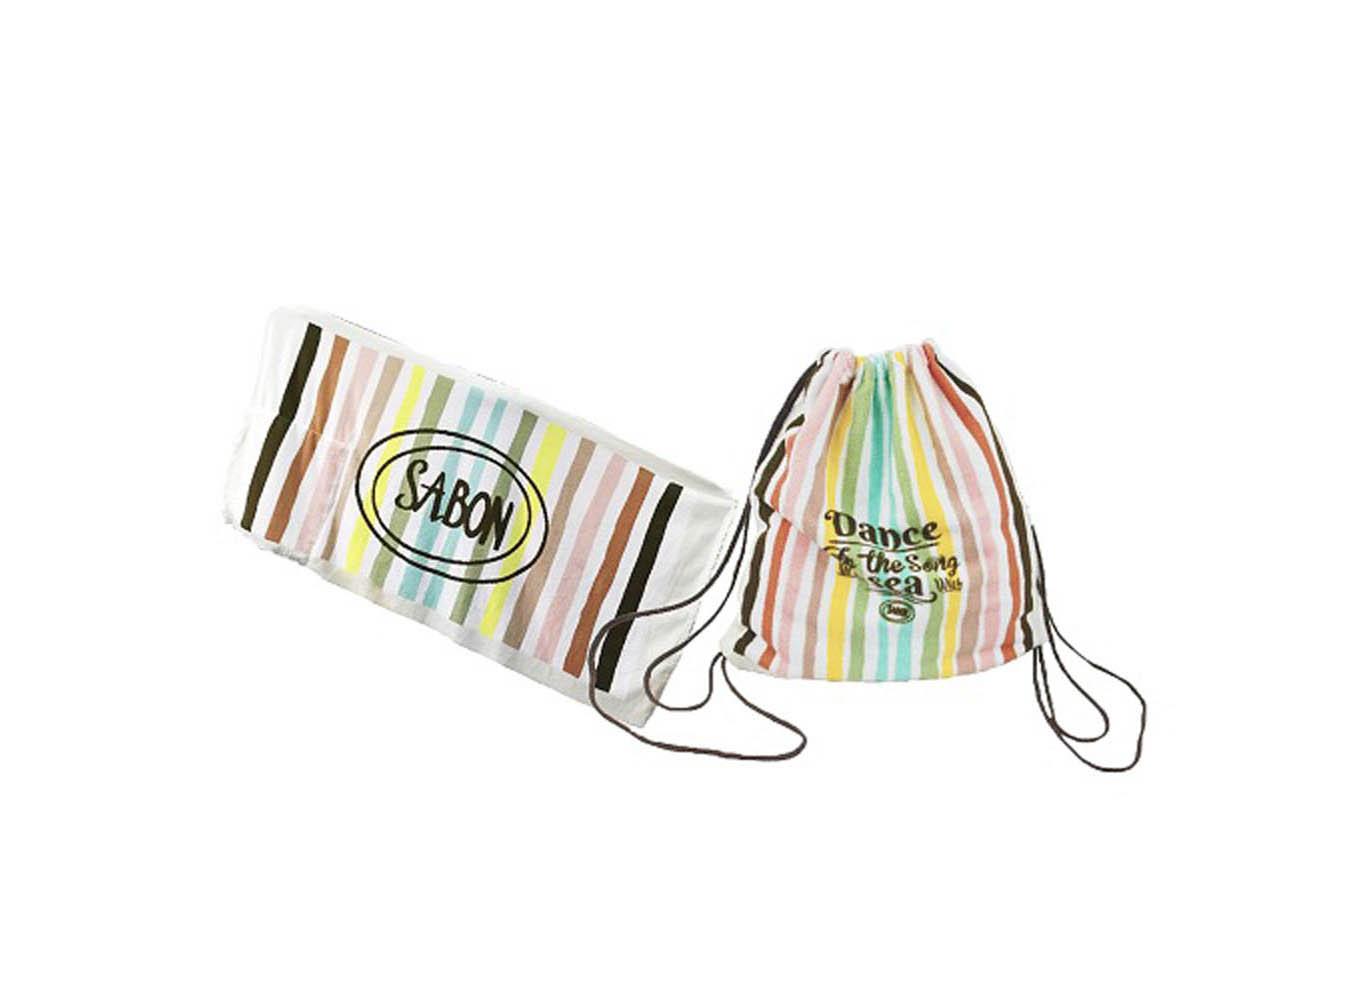 Custom 2-in-1 Microfiber Towel & Drawstring Backpack